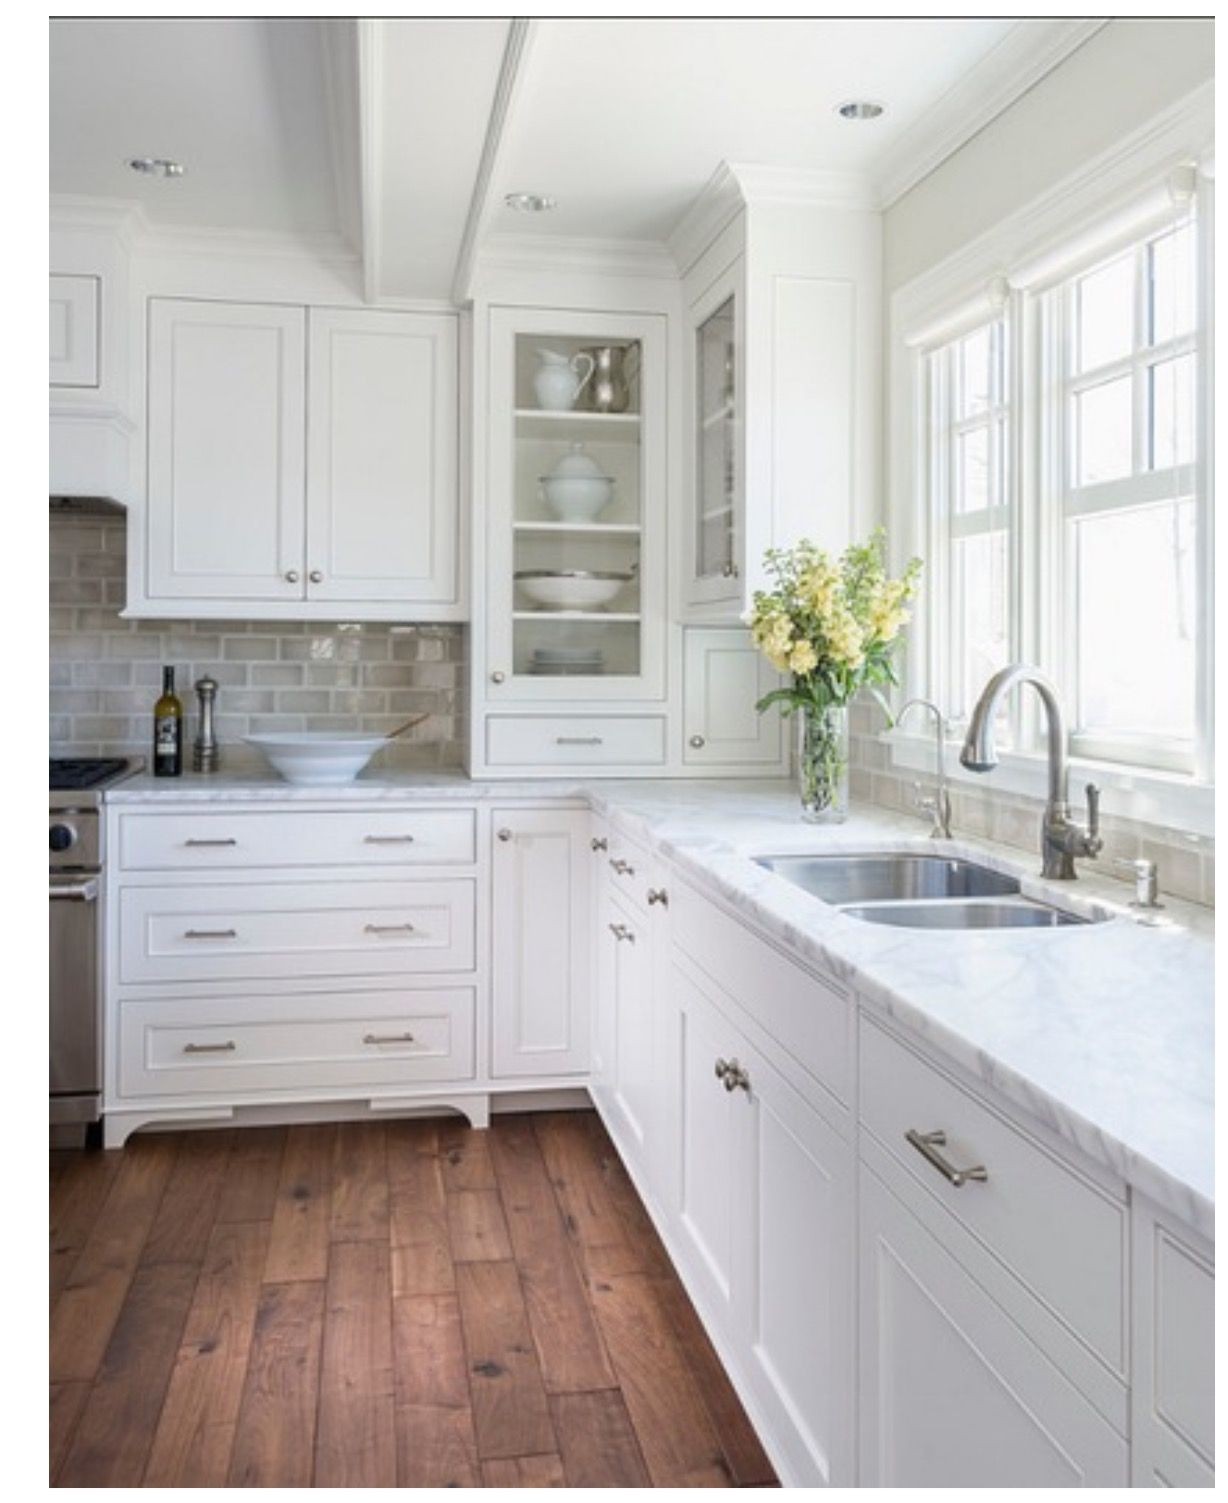 Kitchen in Simply White Benjamin Moore | White kitchen ...